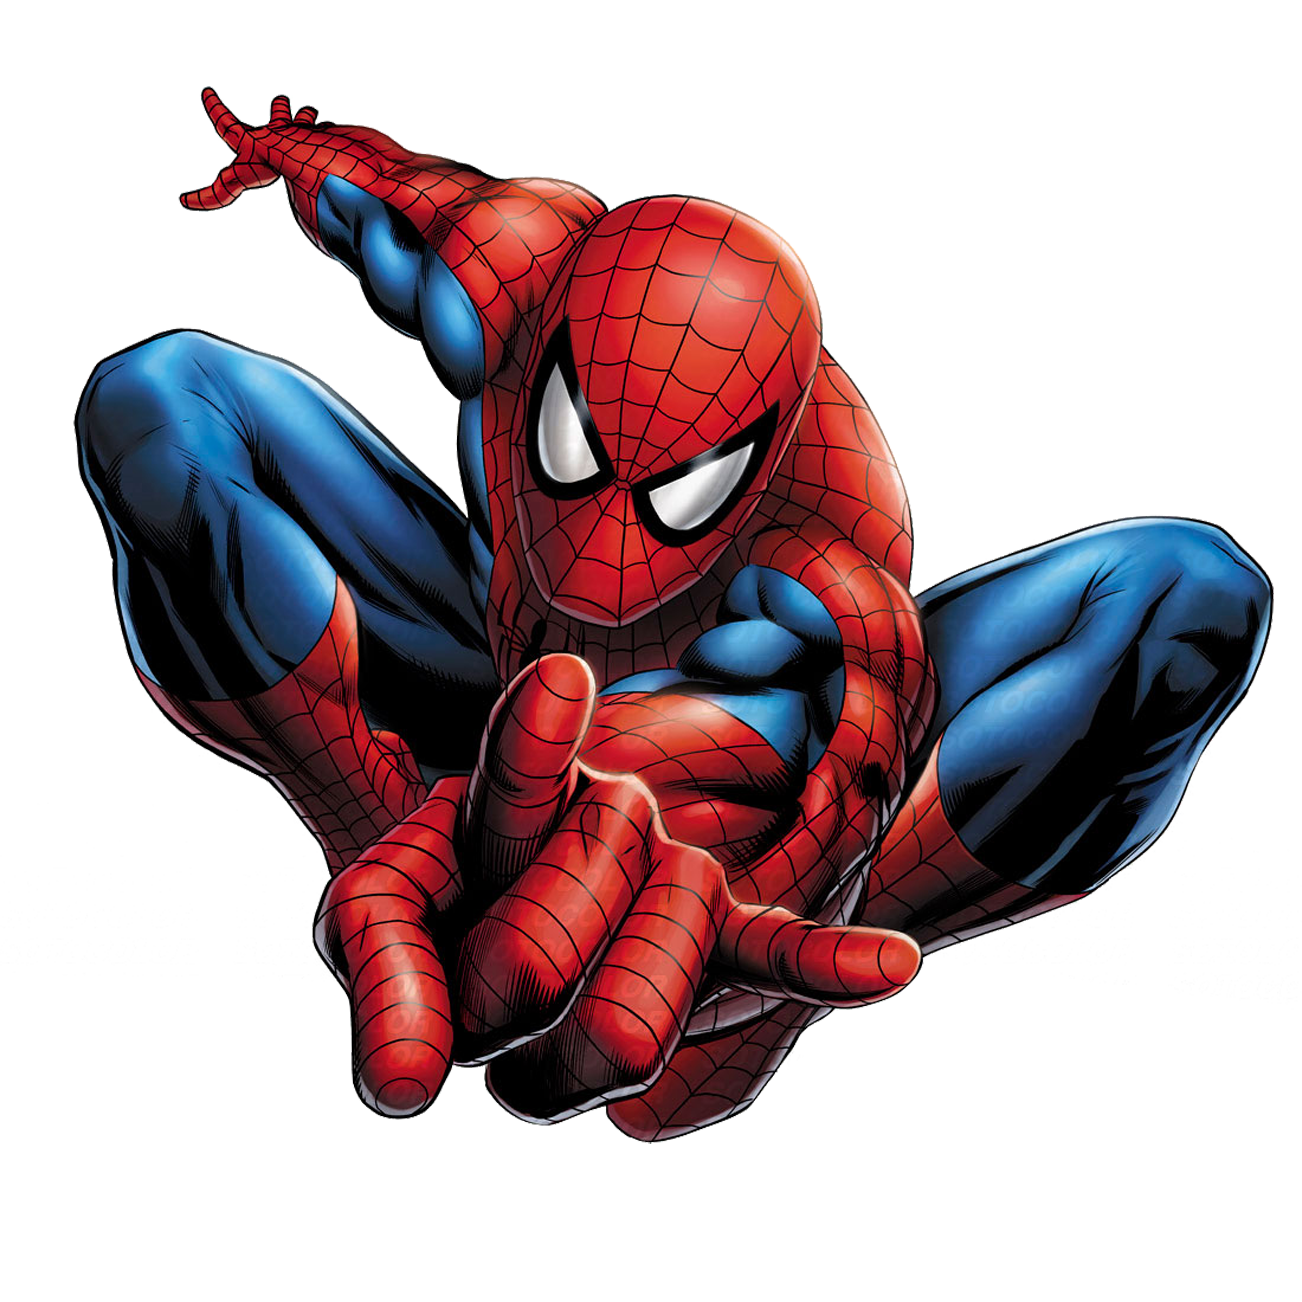 C cd a ca. Spider clipart spiderman spider